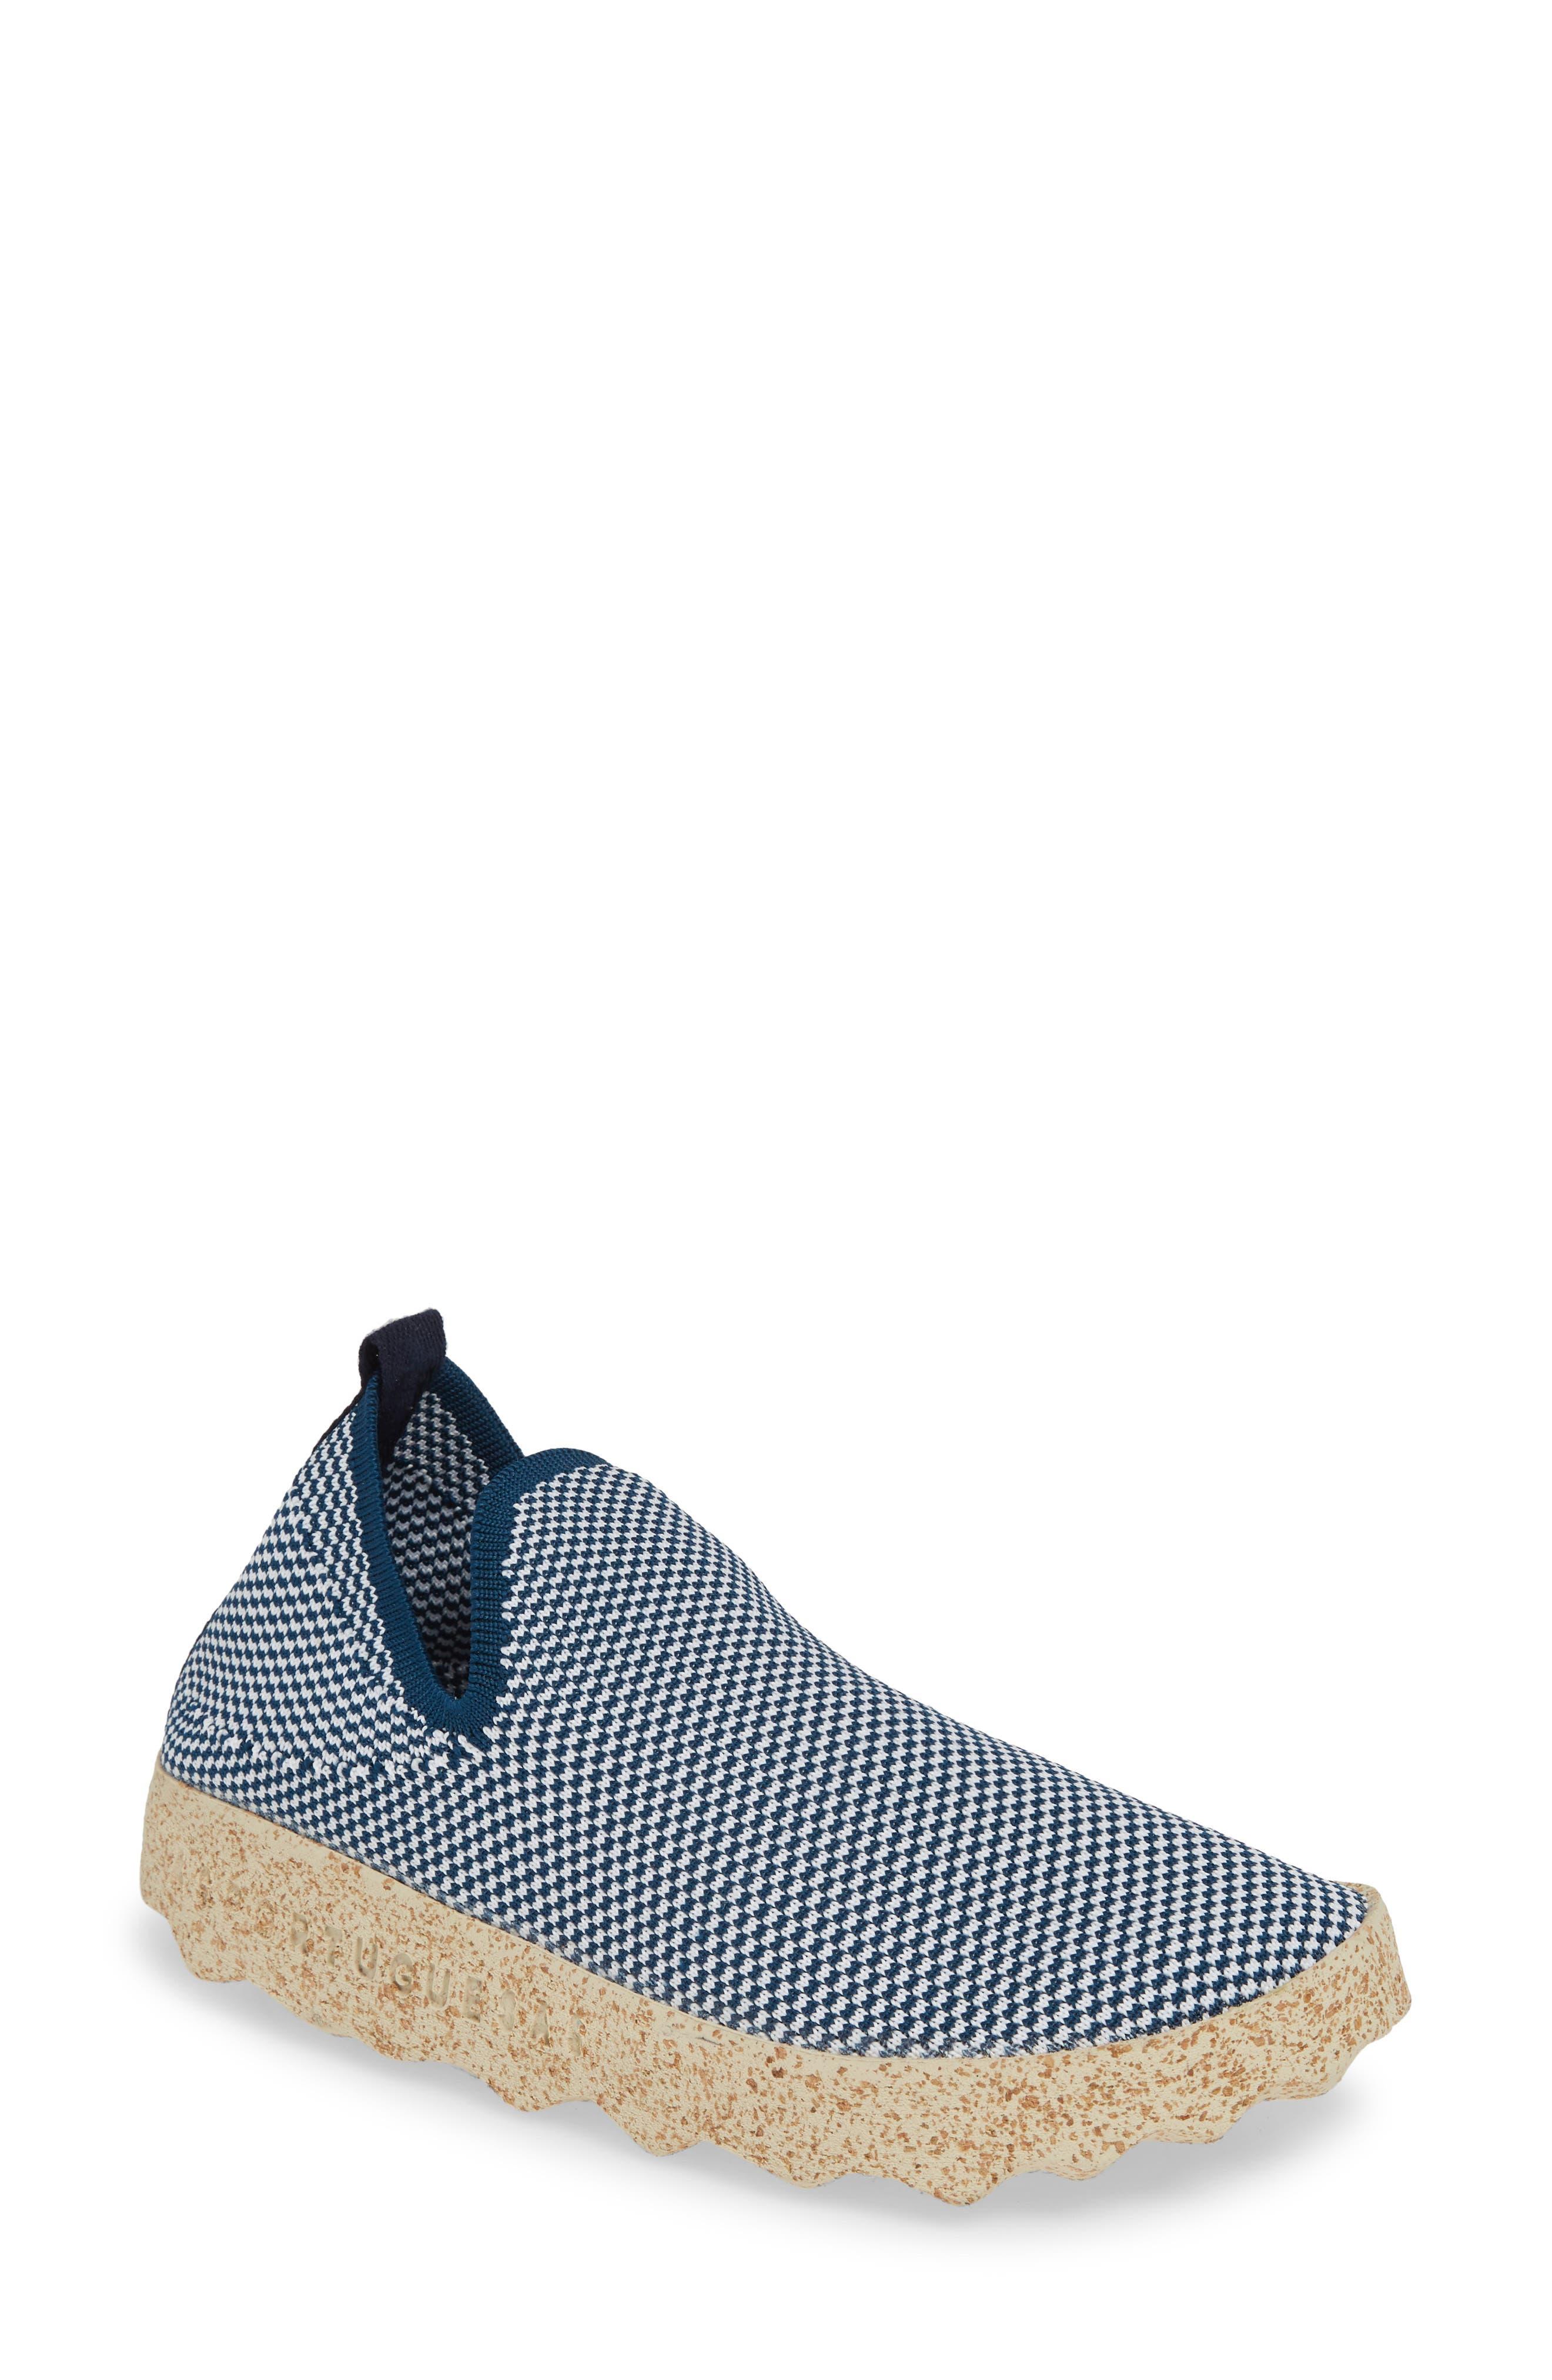 Asportuguesas By Fly London Care Sneaker - Blue